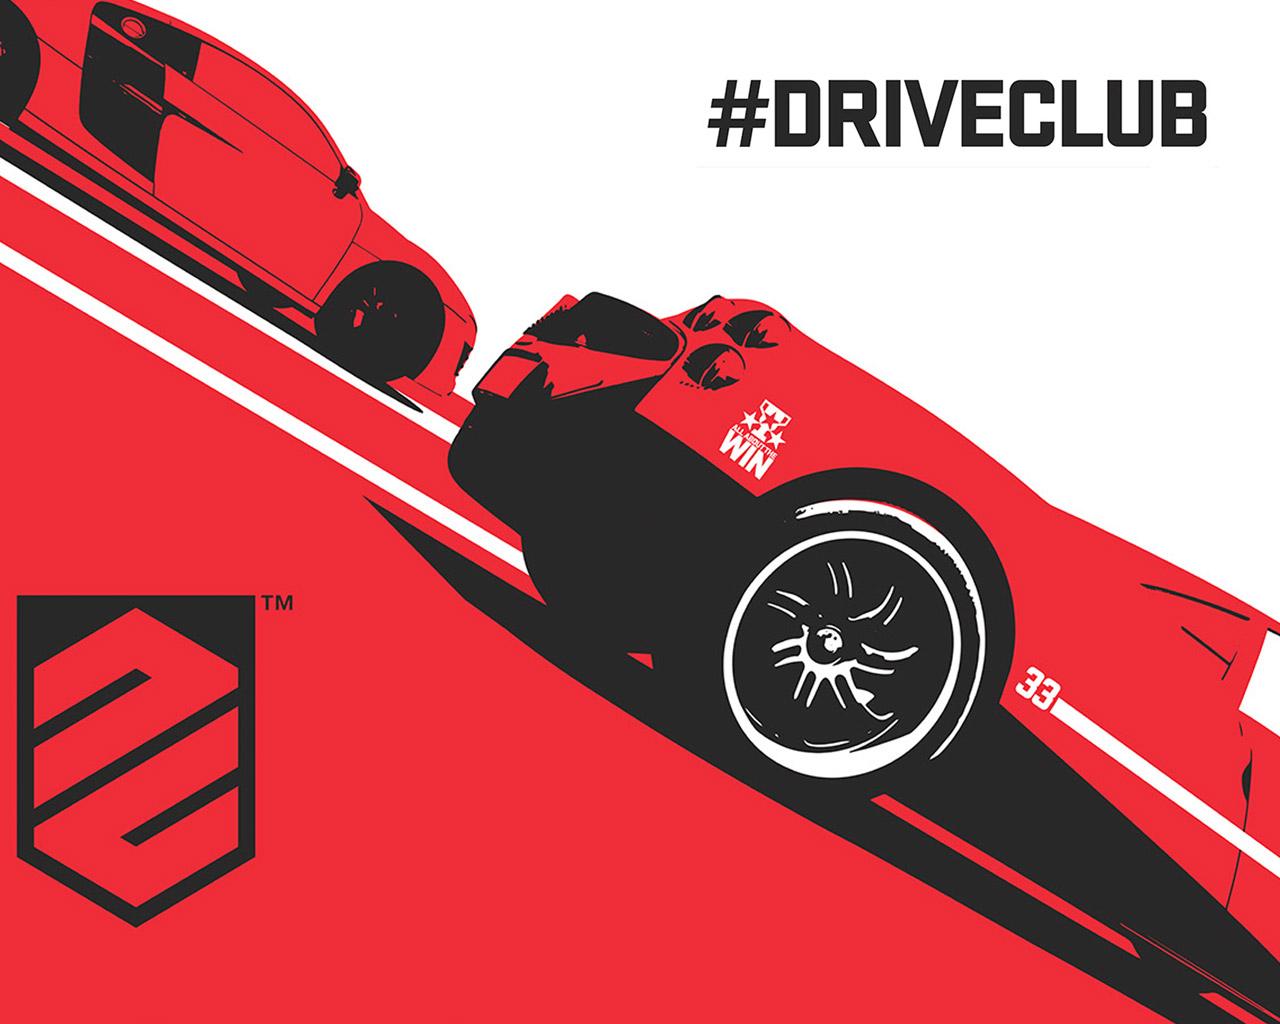 Free Driveclub Wallpaper in 1280x1024